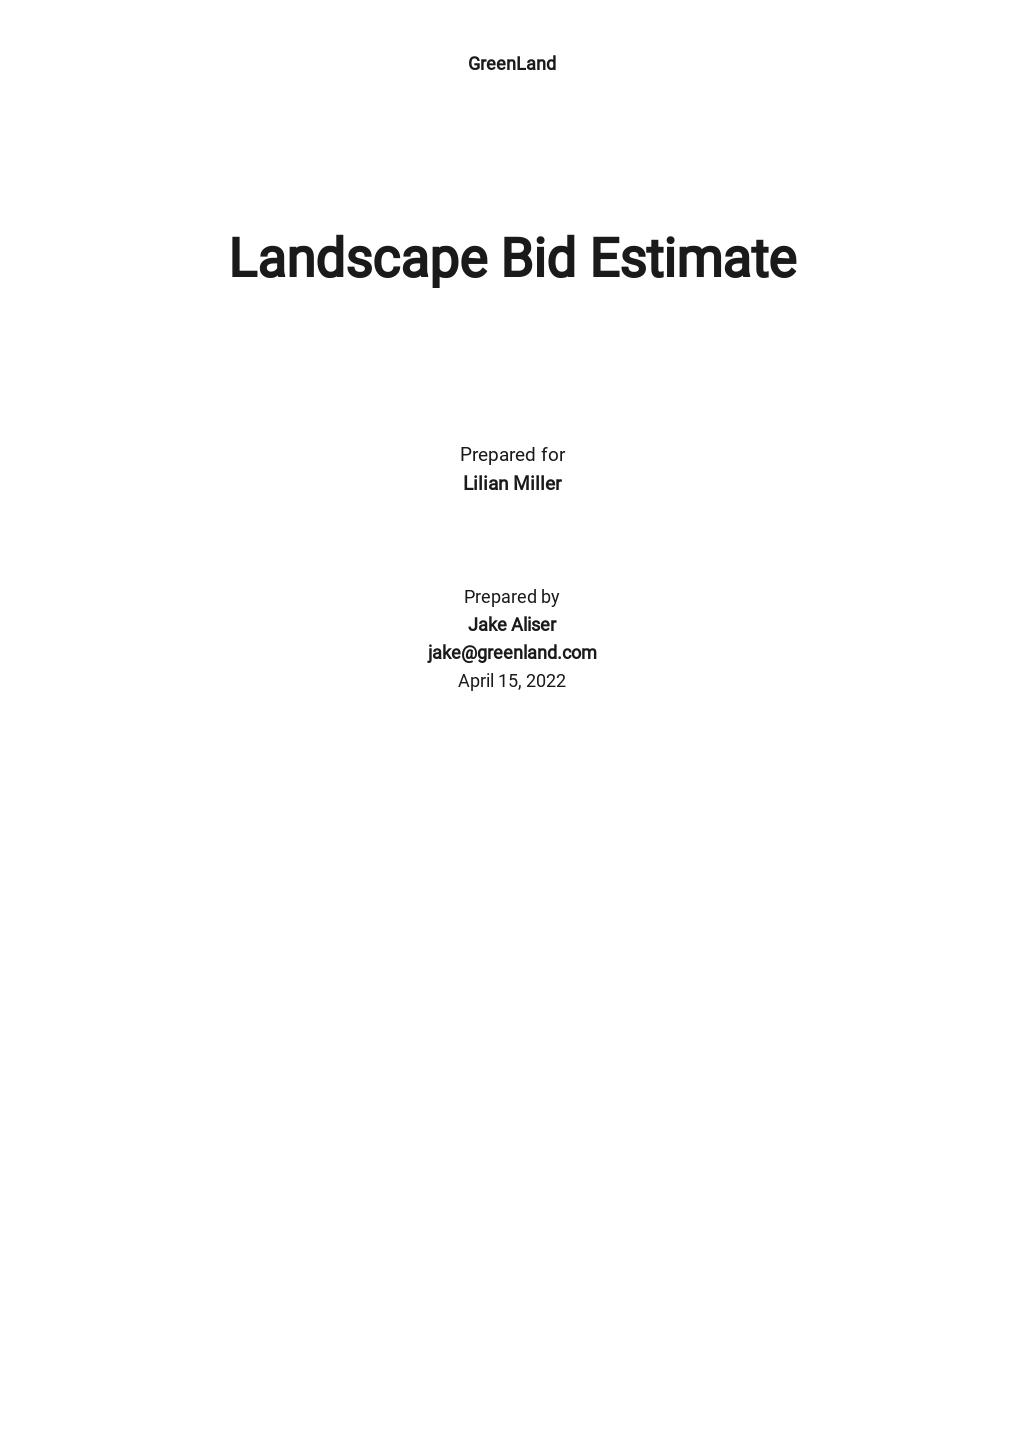 Landscape Bid Estimate Template.jpe